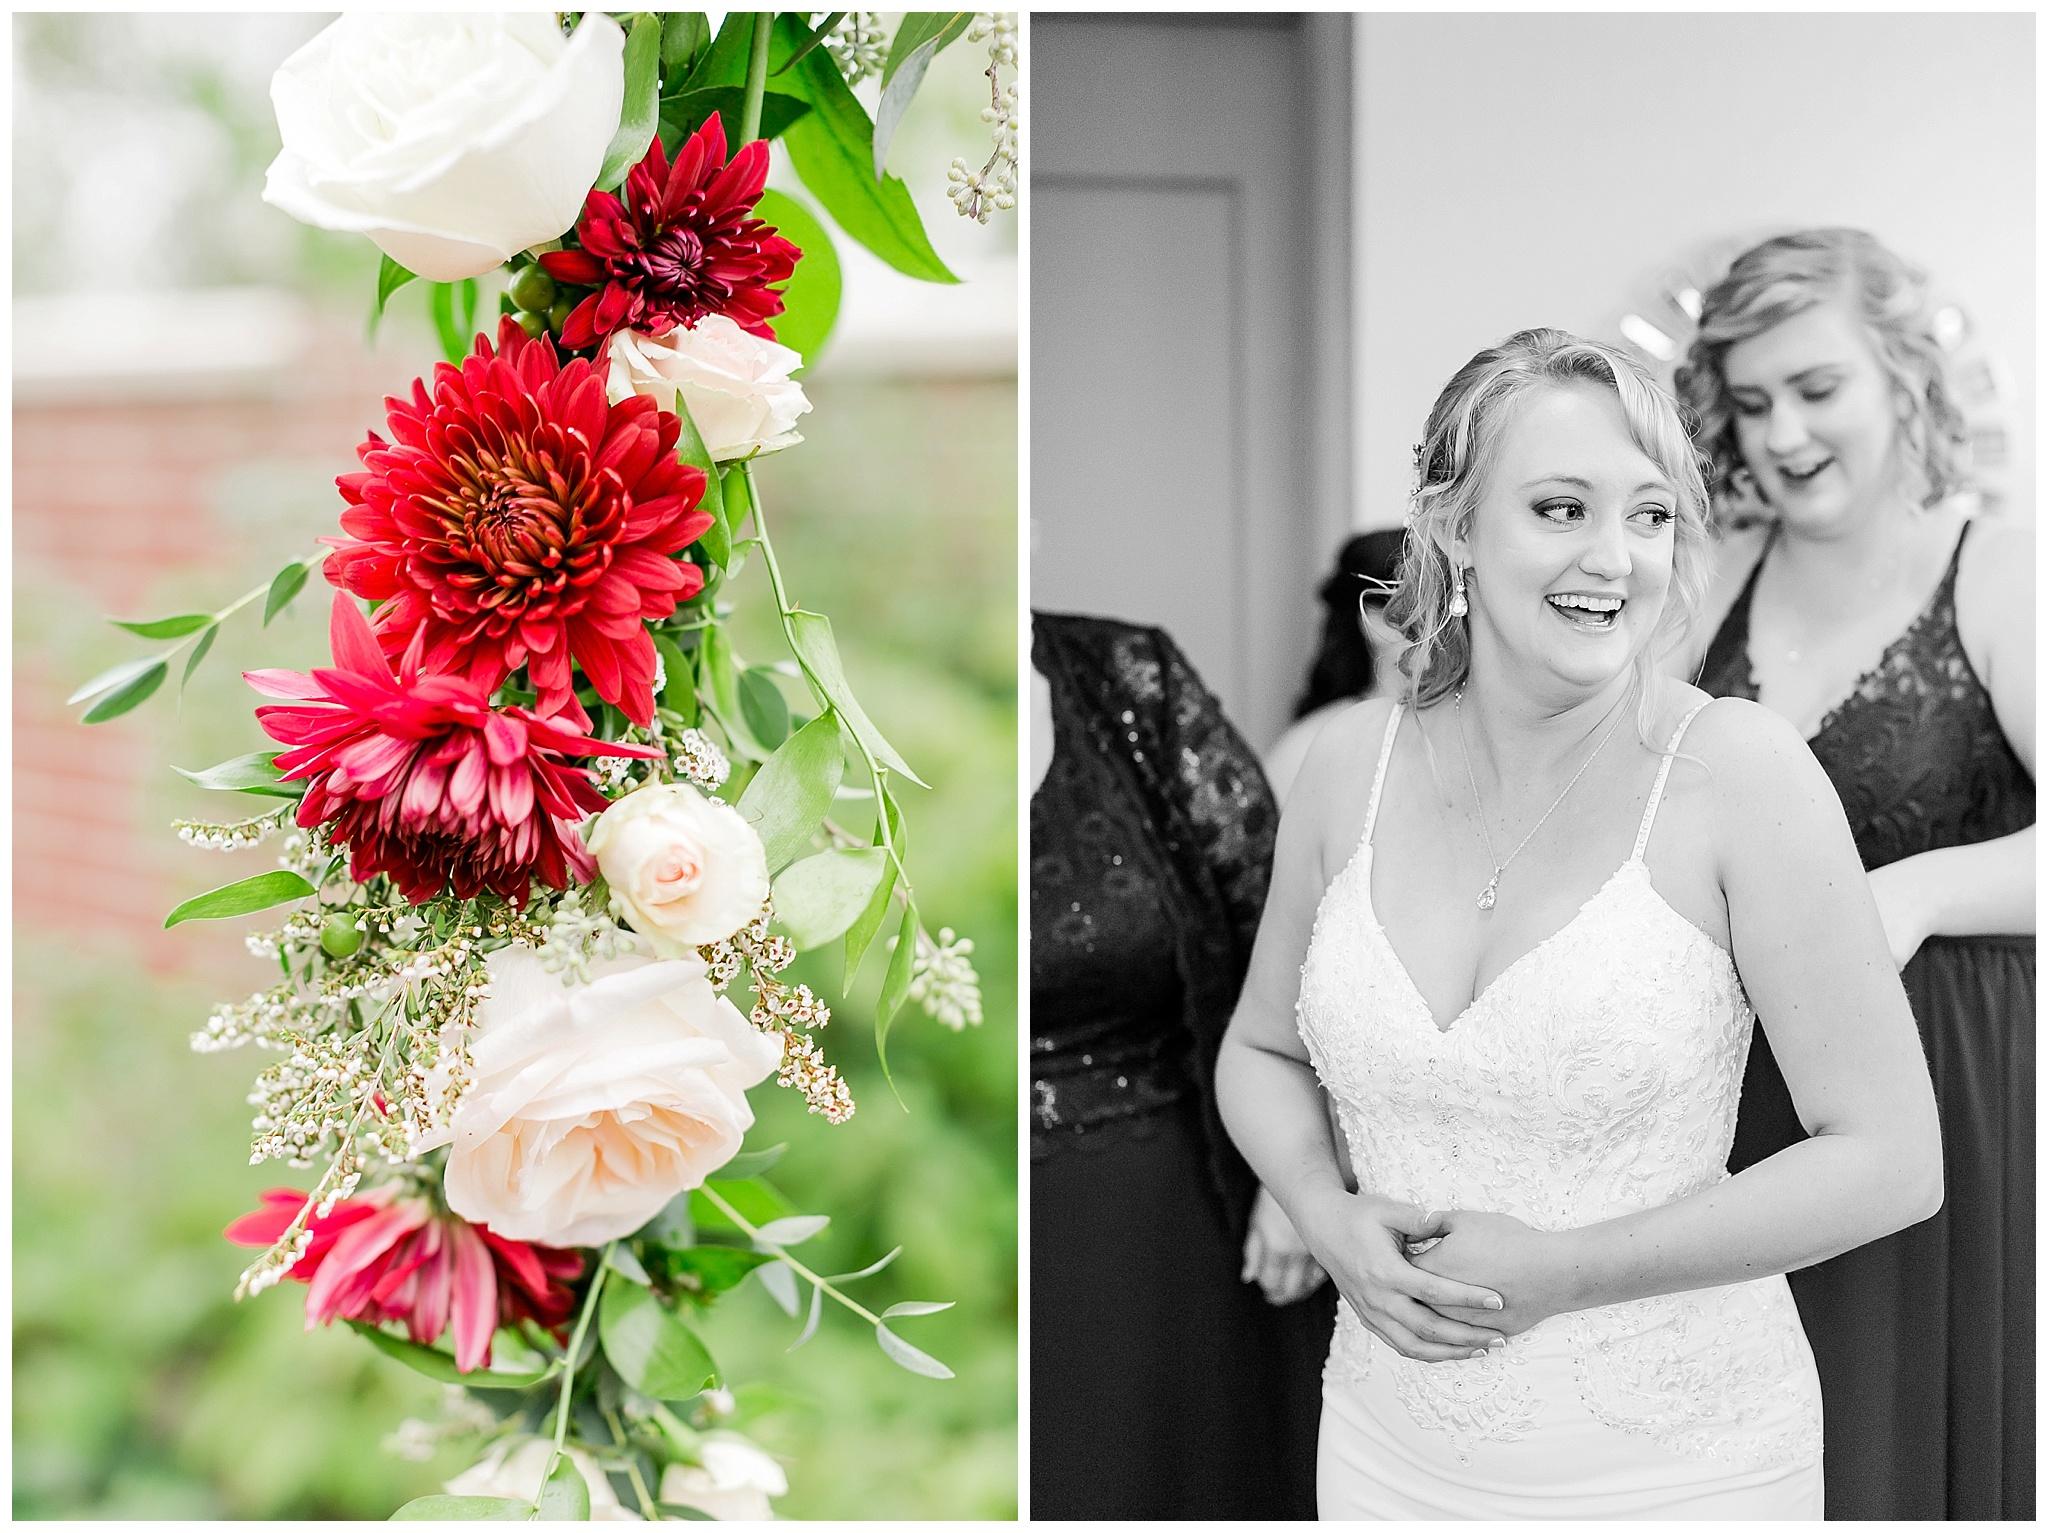 noahs_event_venue_sun_pairie_madison_wisconsin_wedding_photographers_0286.jpg